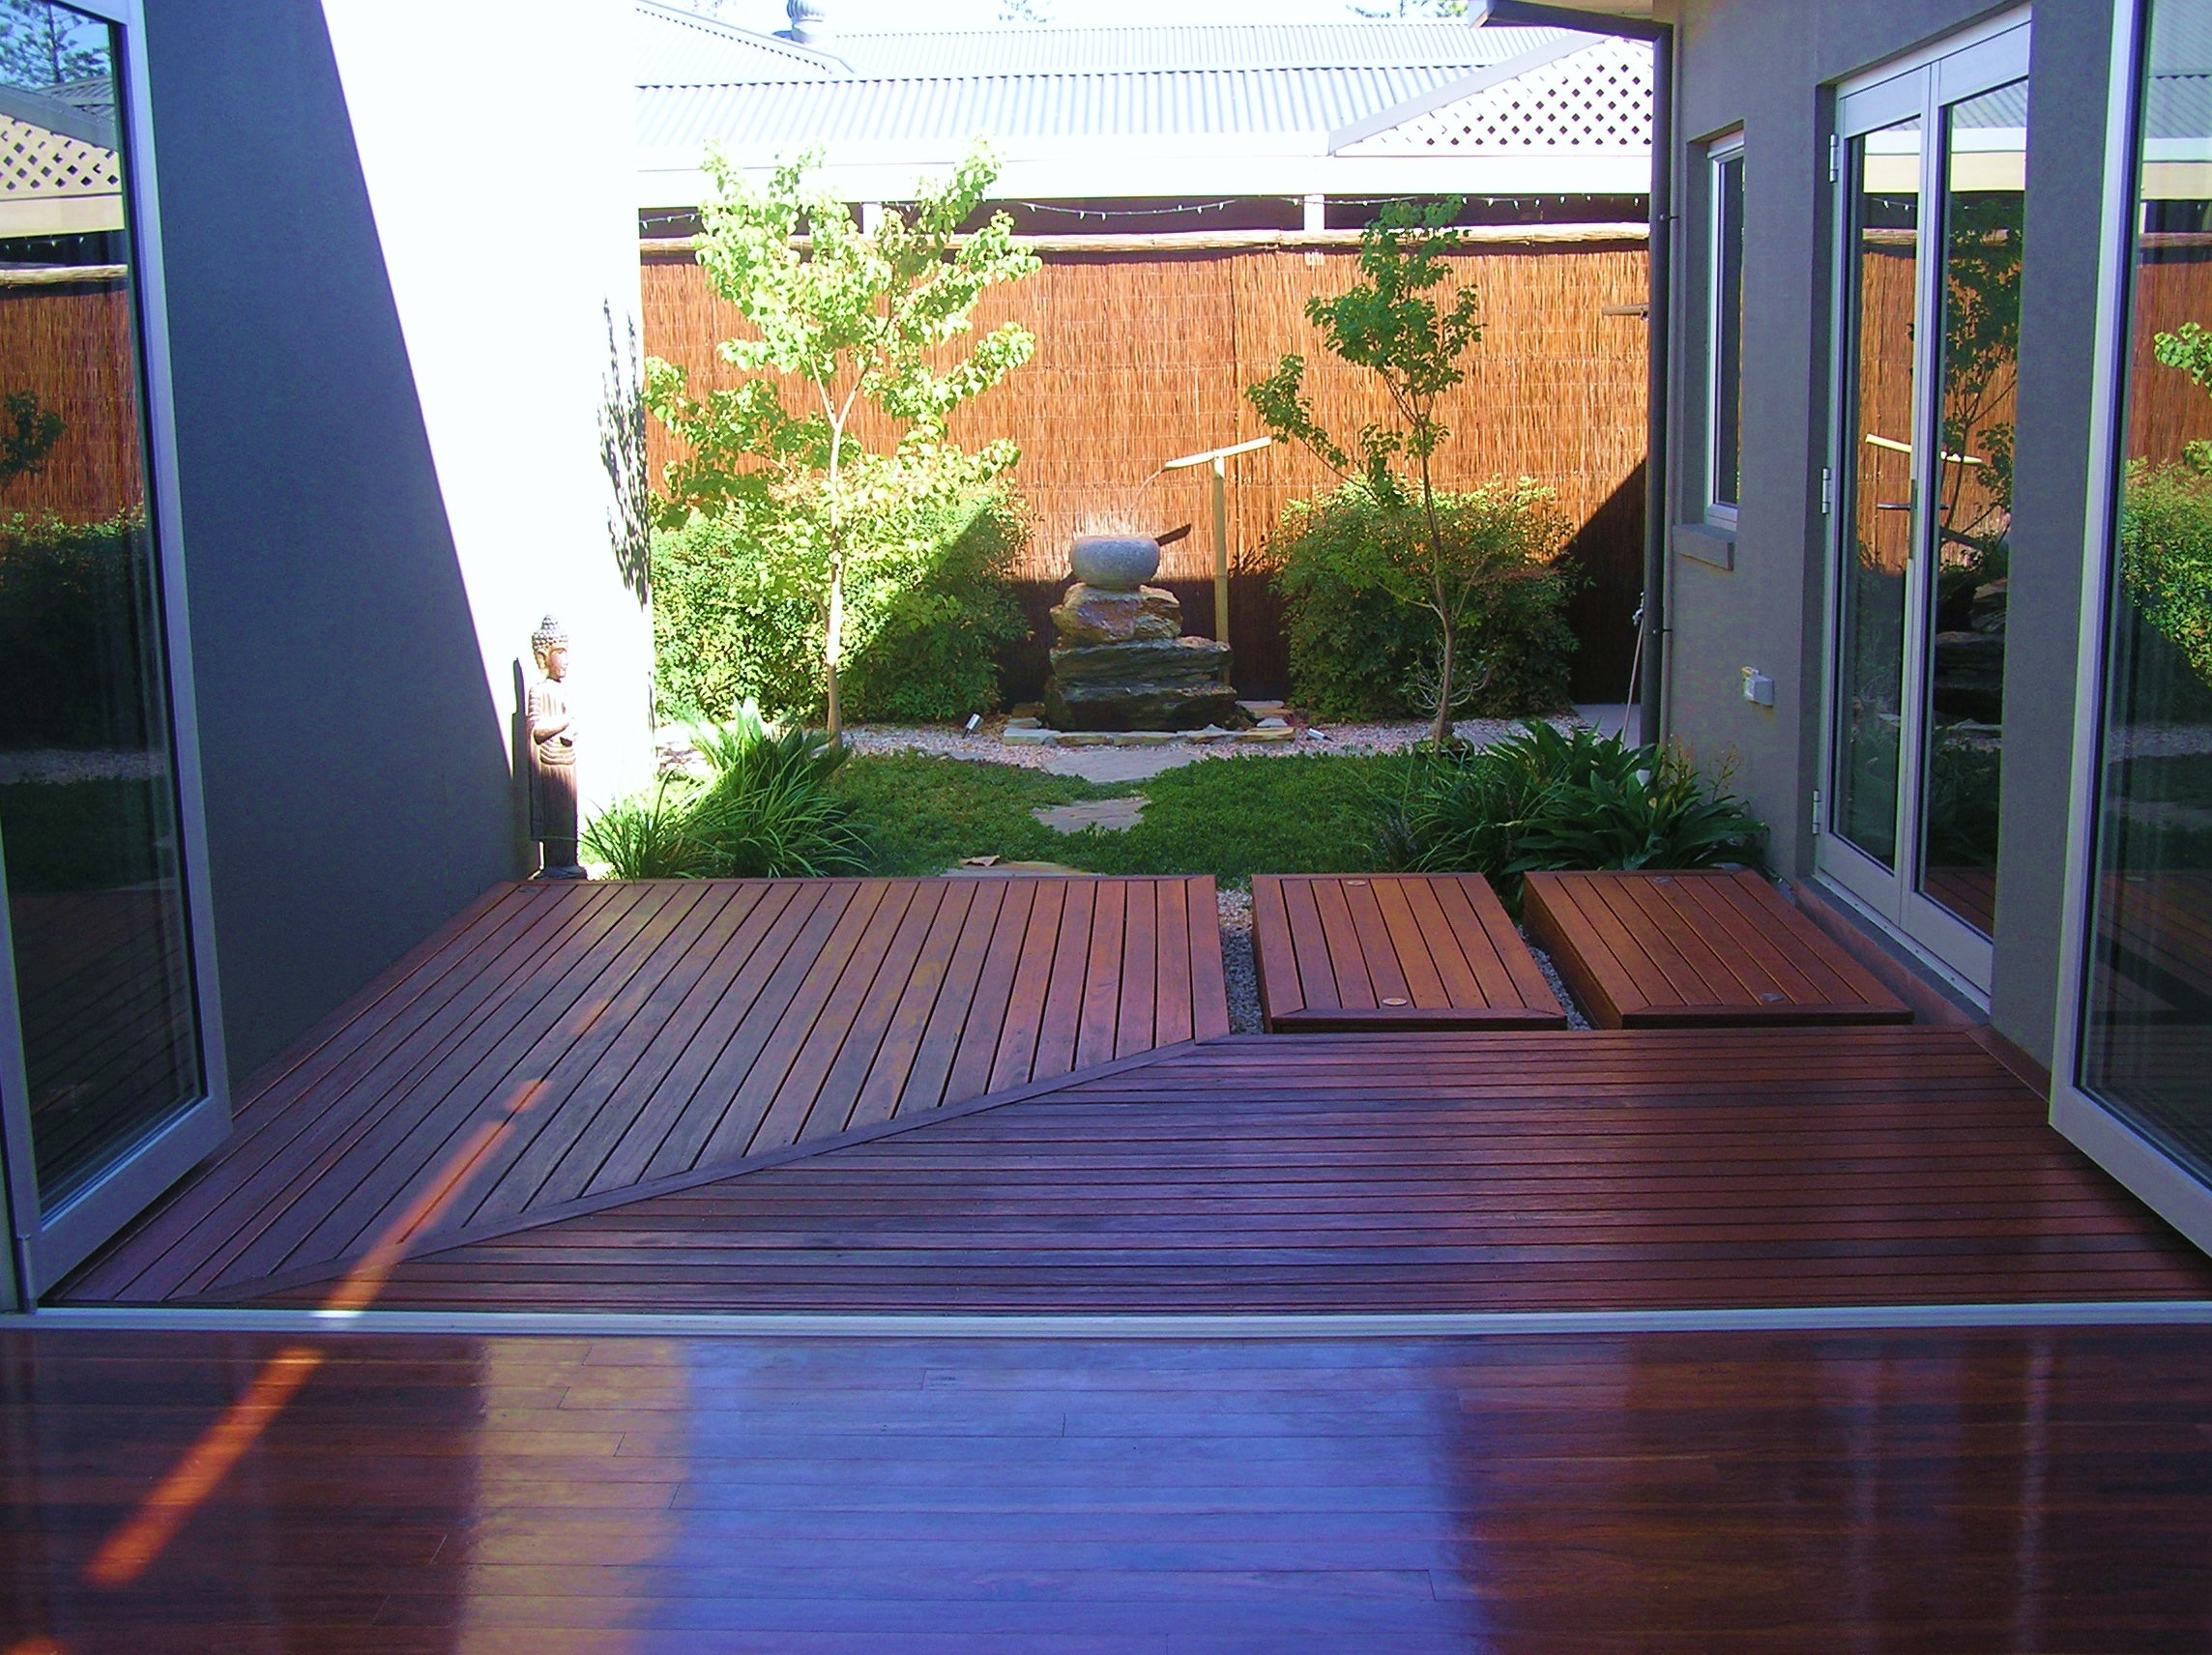 Glenelg north caroline dawes garden design adelaide for Courtyard home designs adelaide